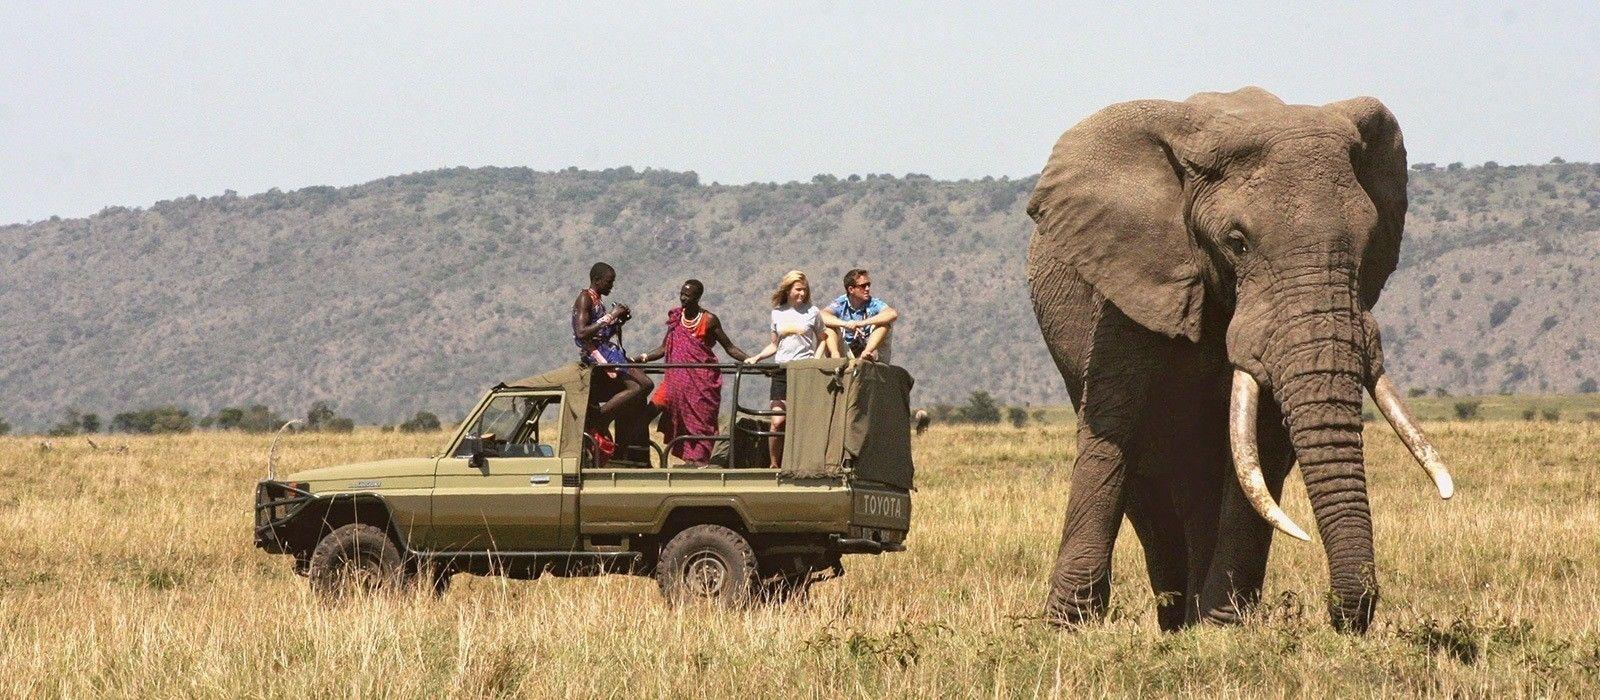 Kenia Hautnah: Safari Höhepunkte Urlaub 3